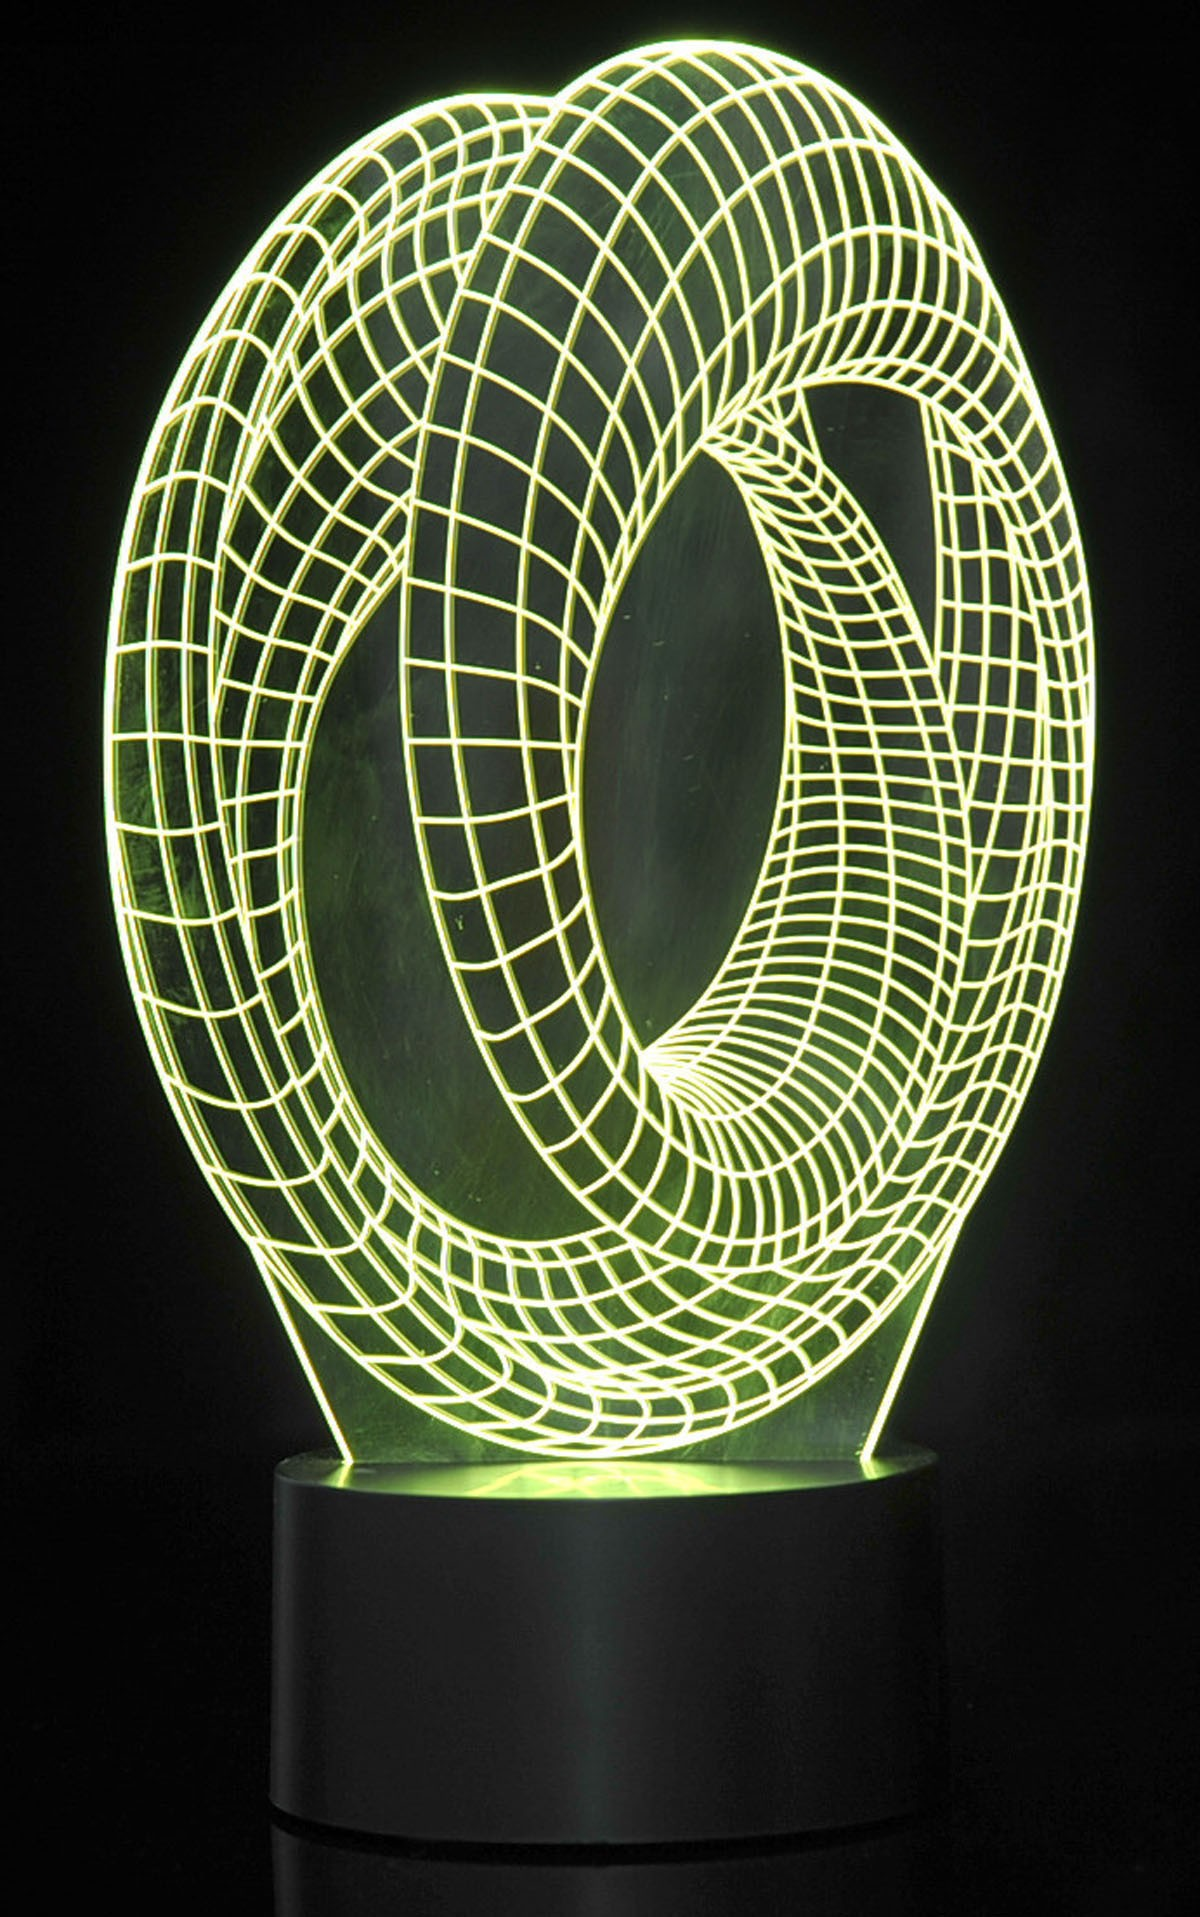 3D Corkscrew Lighting Laser Cut Precision LED Lights